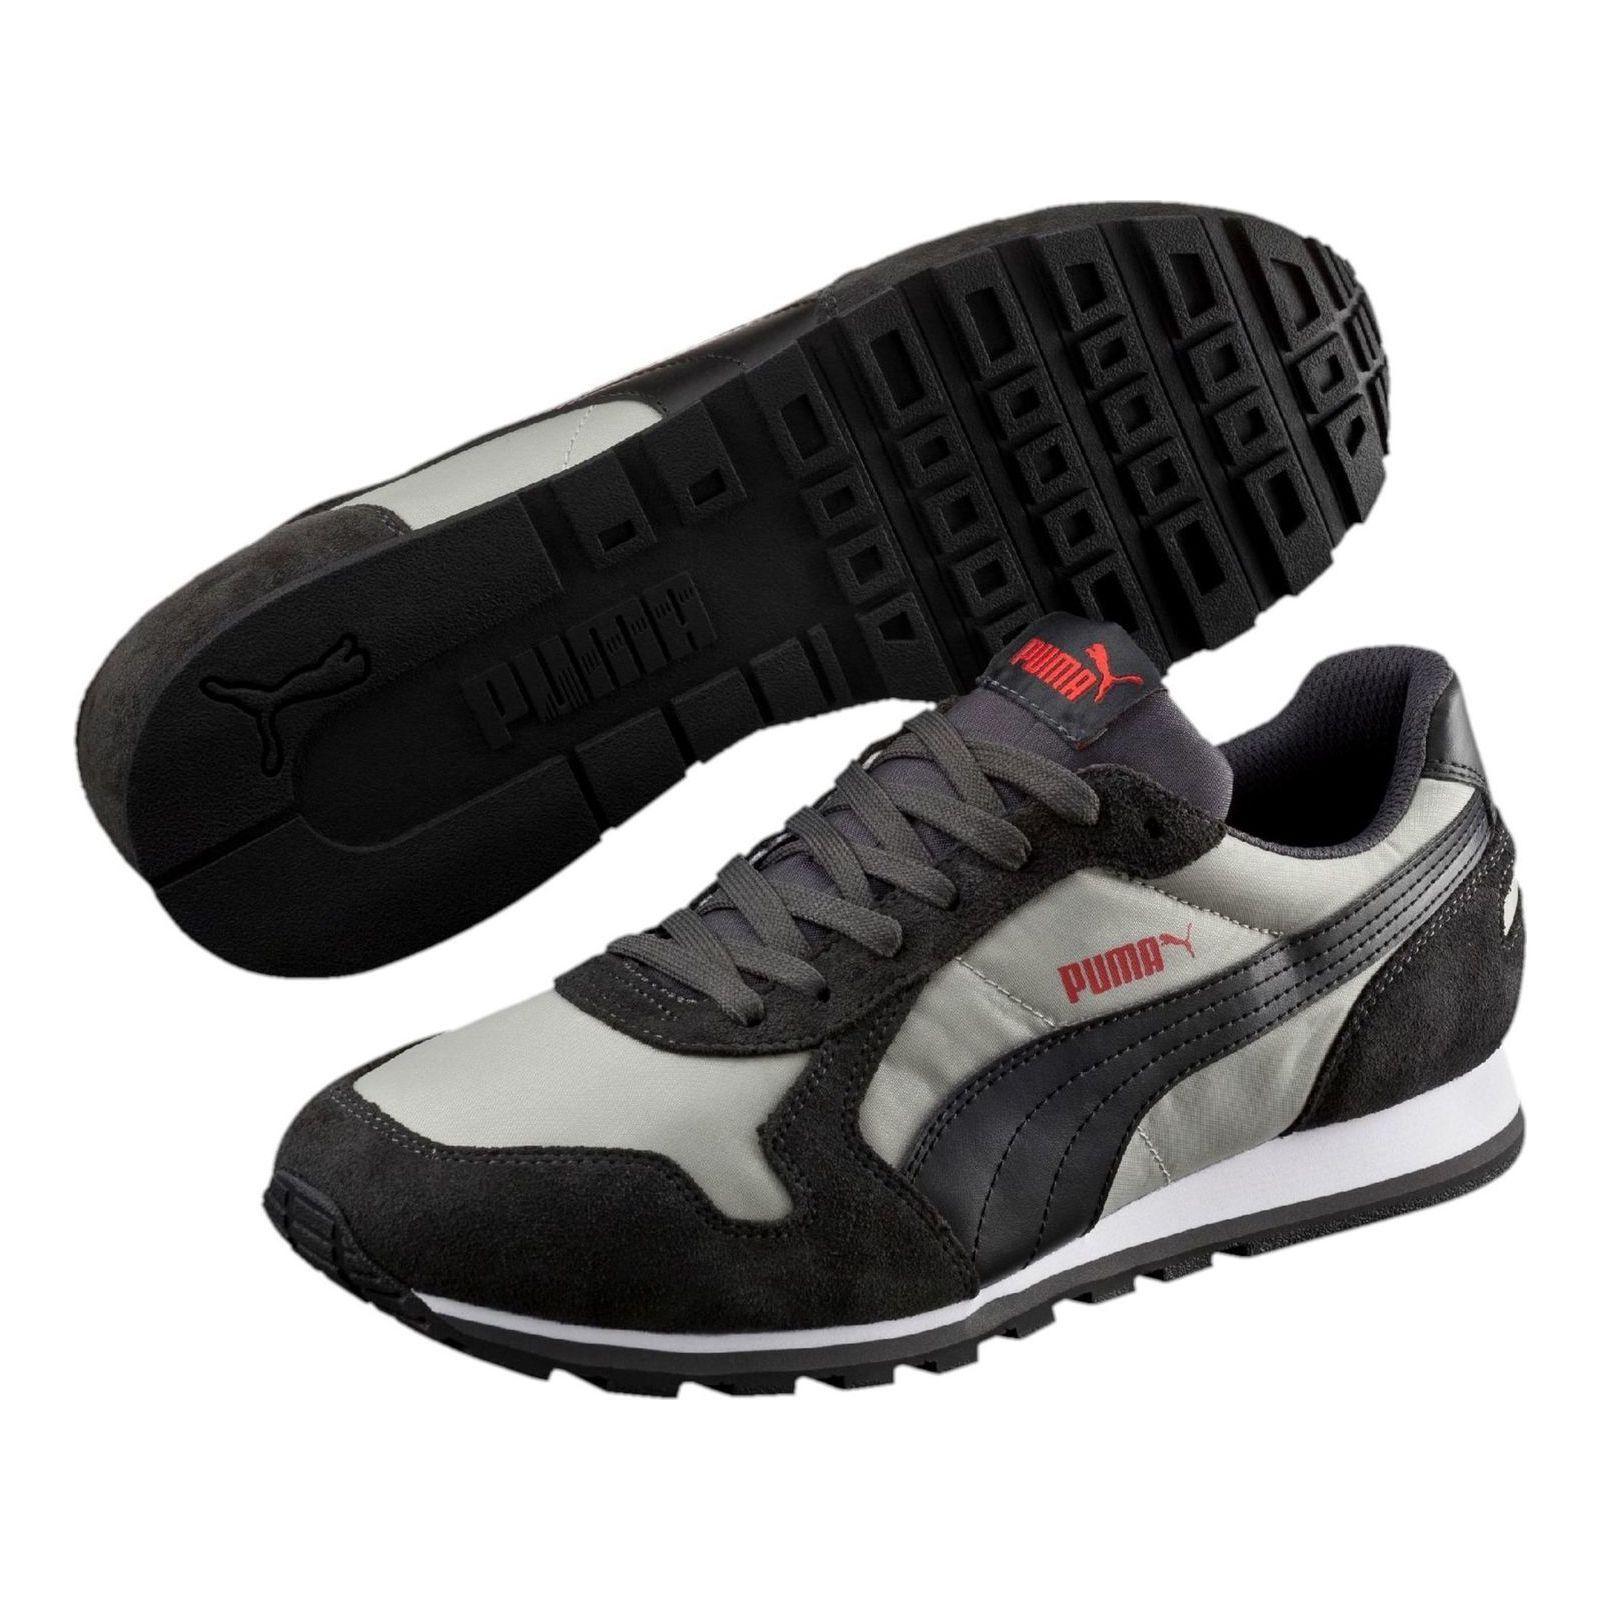 Buty Meskie Puma St Runner Nl 40 46 356738 30 6788620863 Oficjalne Archiwum Allegro Puma Puma Sneaker Shoes